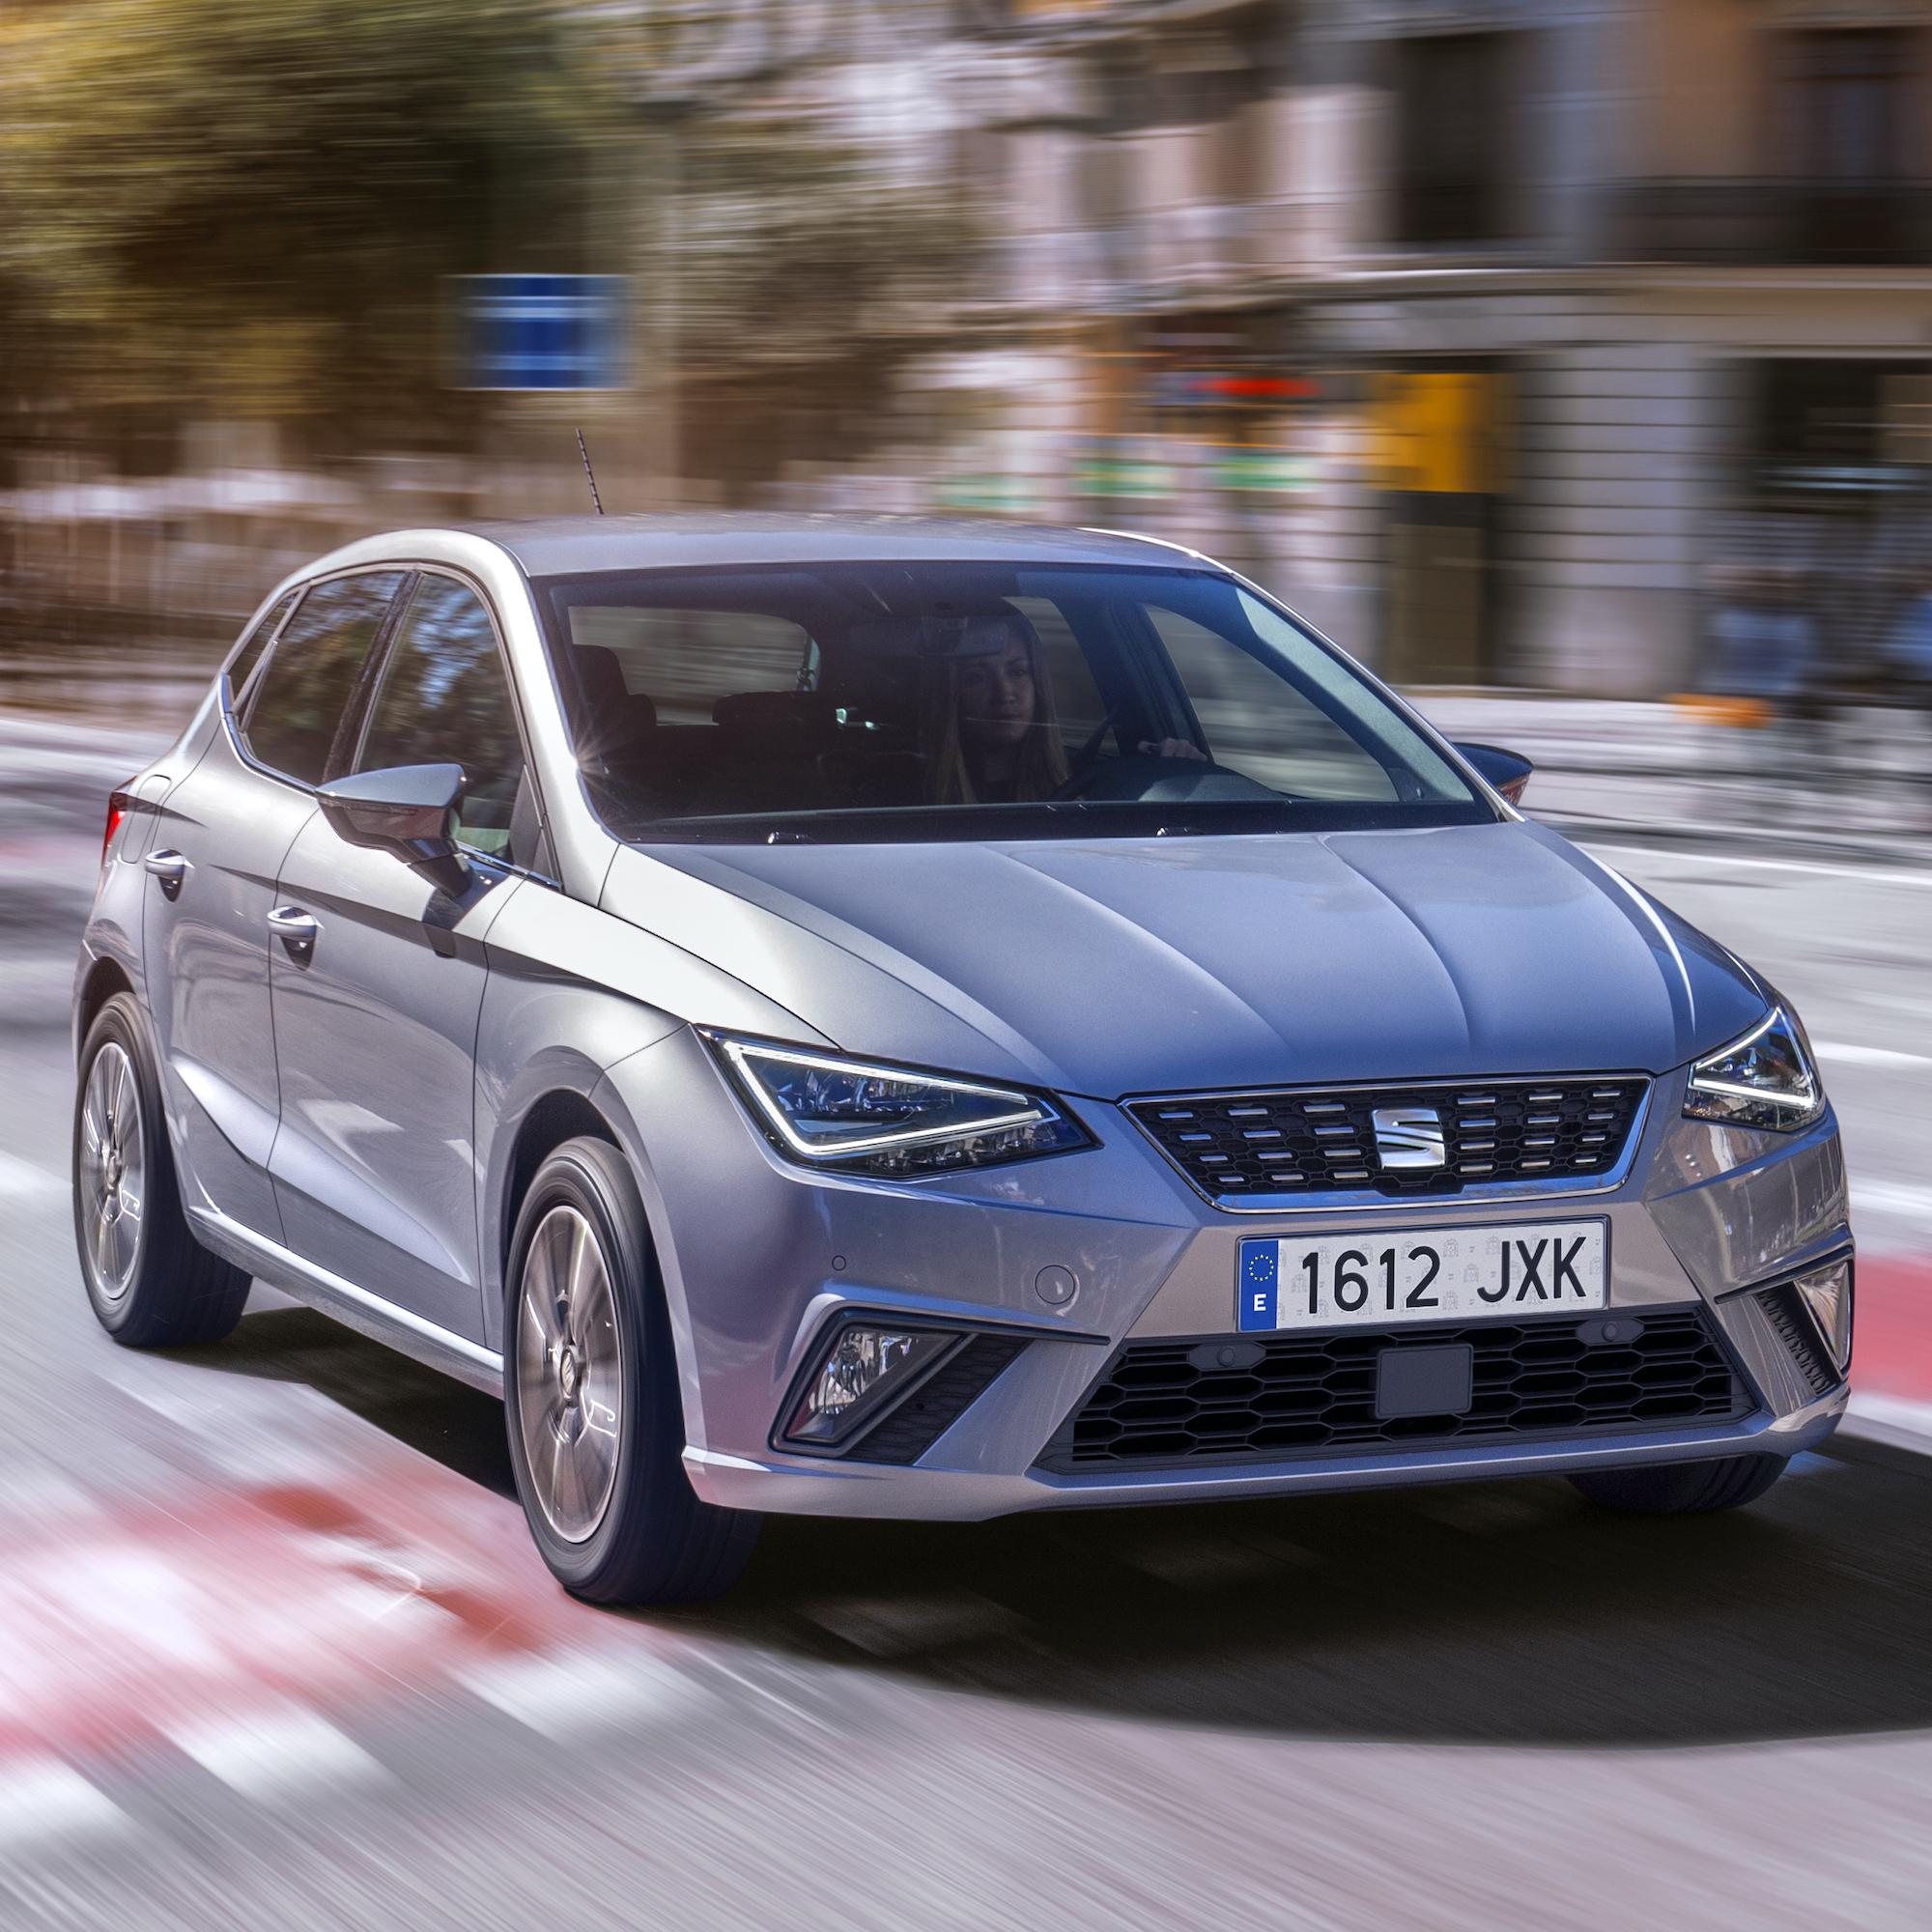 [All-Inclusive-Leasing] Seat Ibiza Xcellence (95 PS) mtl. 239€ od. (110 PS) mtl. 249€, 10.000km, 6 Monate inkl. Vollkasko, Überführung, etc.